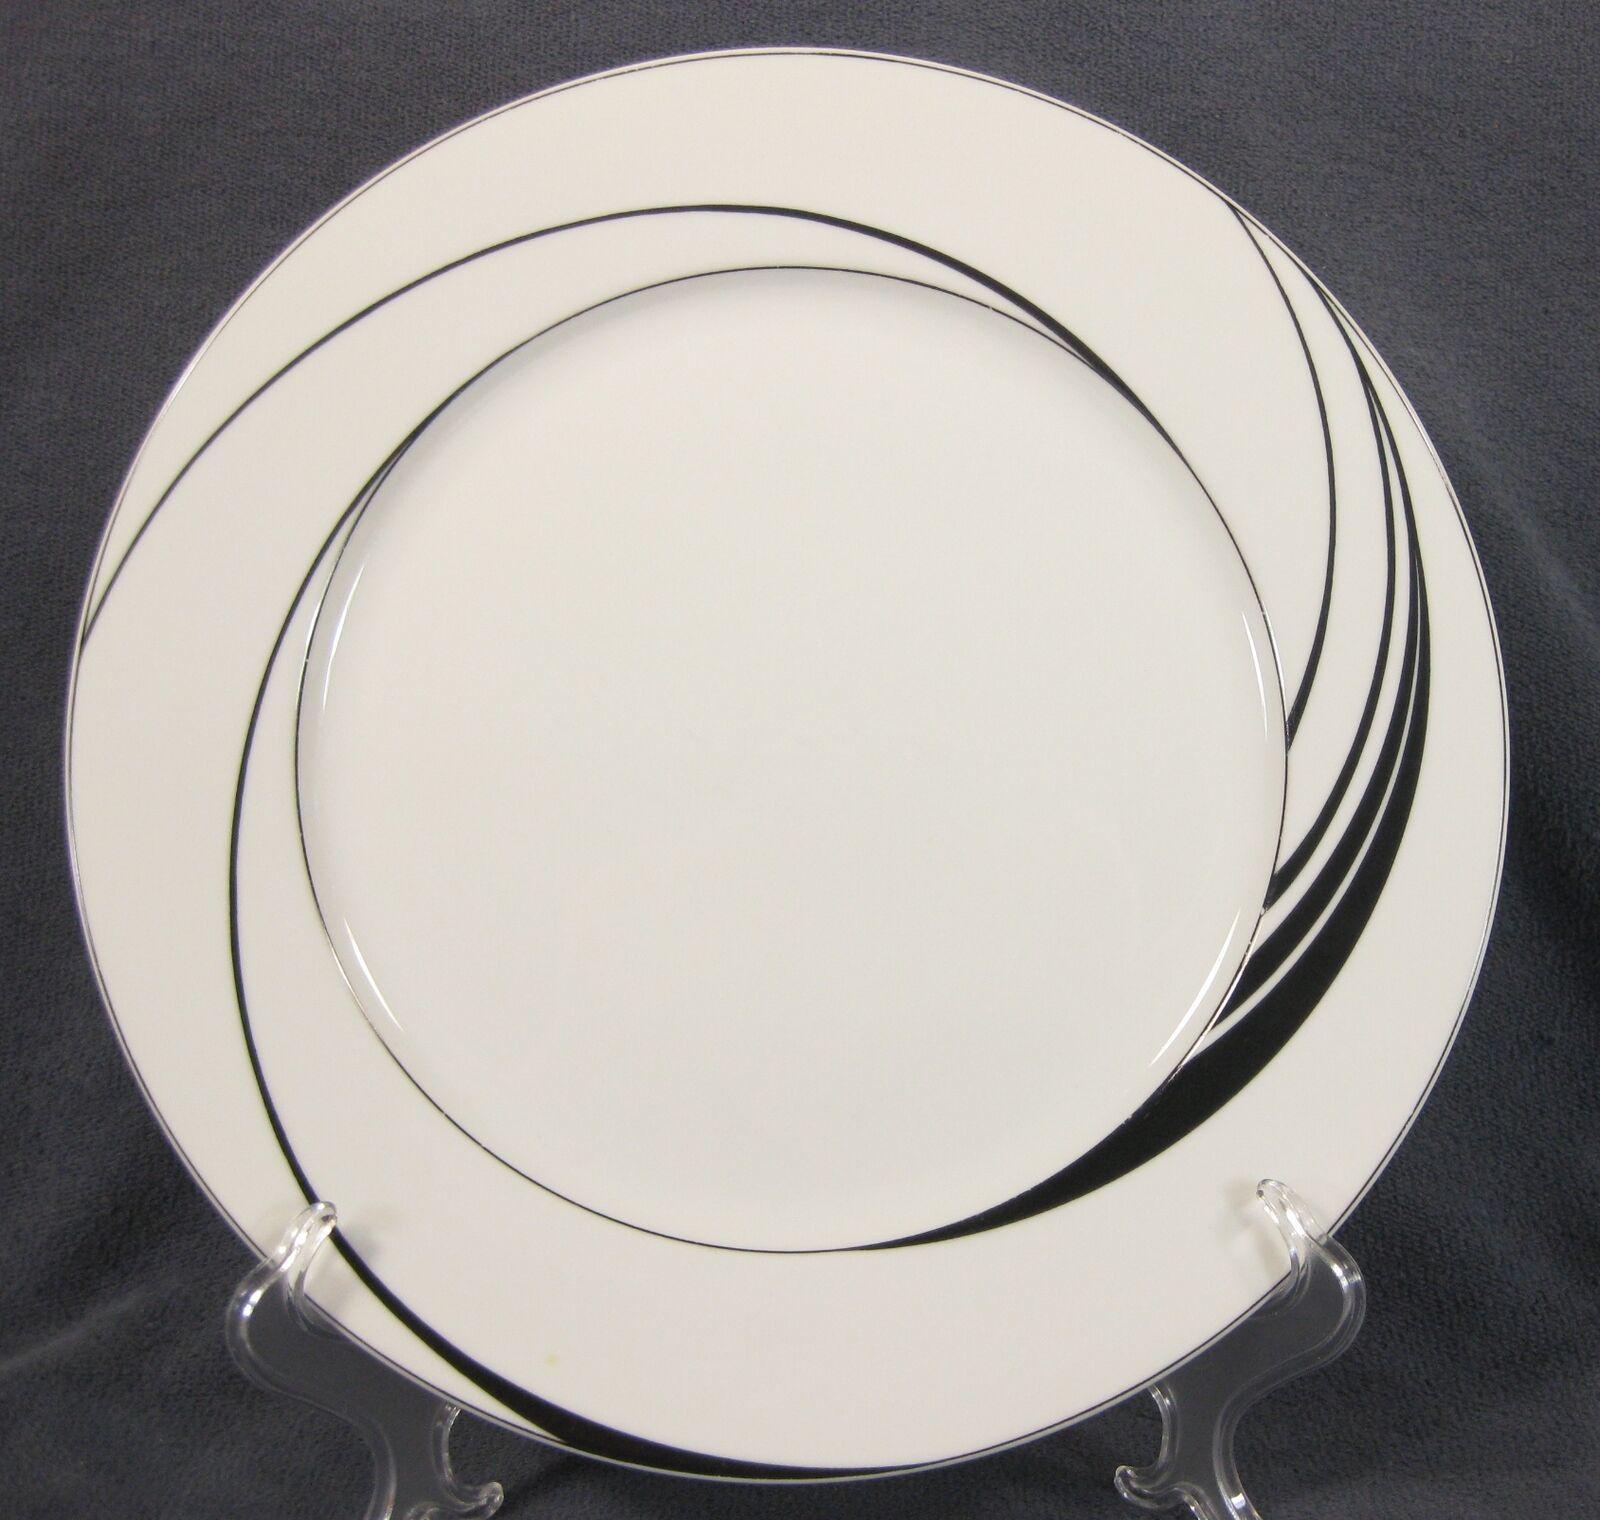 Block White Pearl Dinner Plates Spal Jewels Black Swirls Jack Prince Portugal